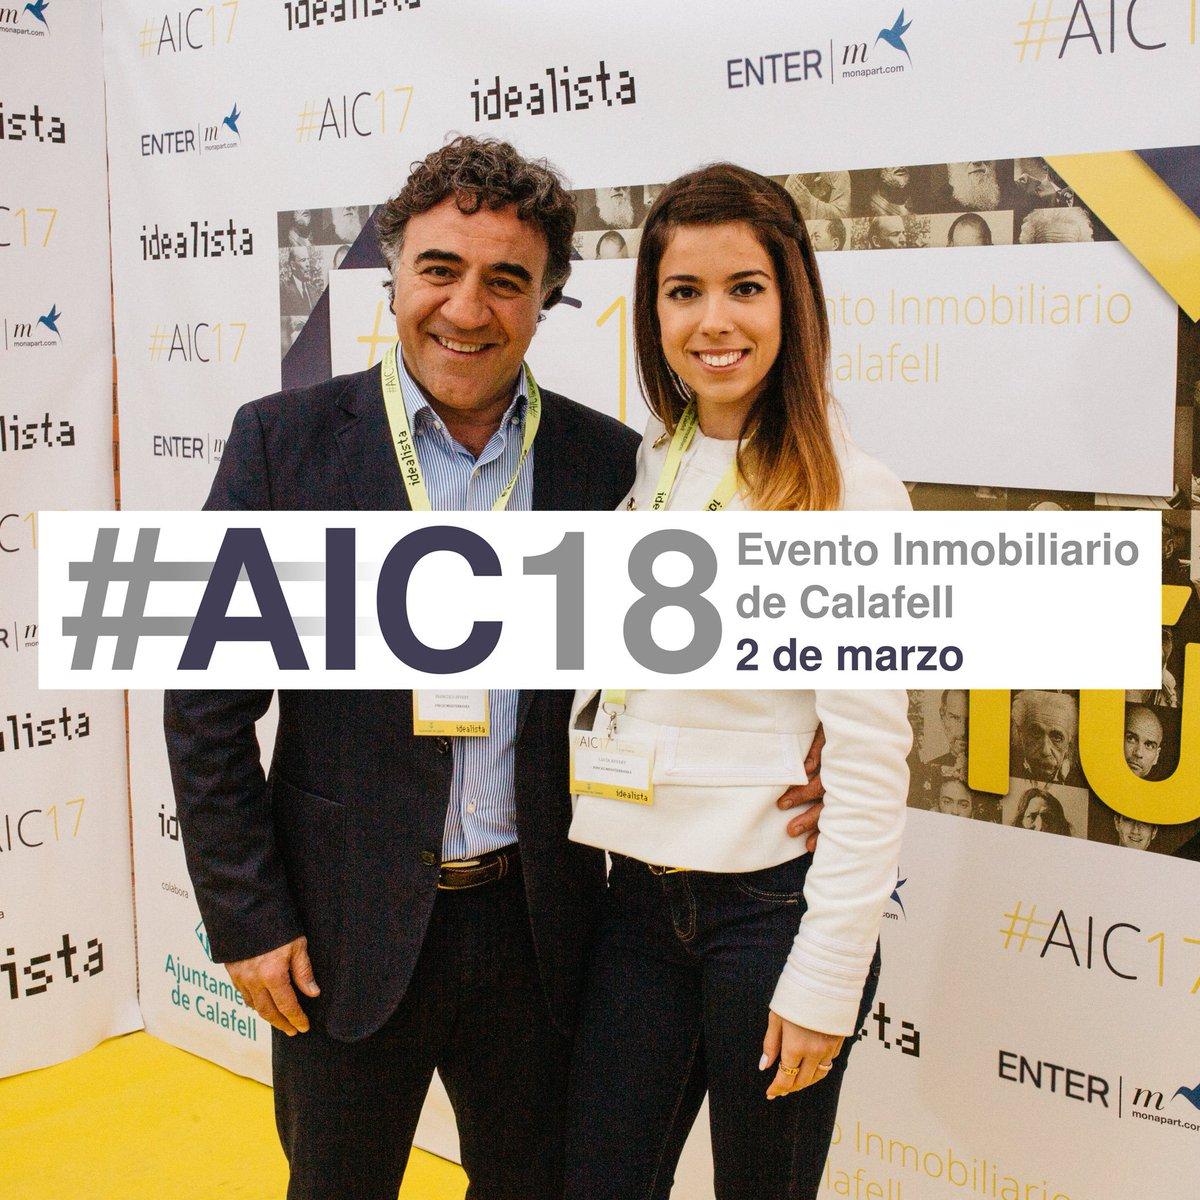 Recuerdos de #AIC17 🖤 #AIC18 #Calafell #Inmobiliarios